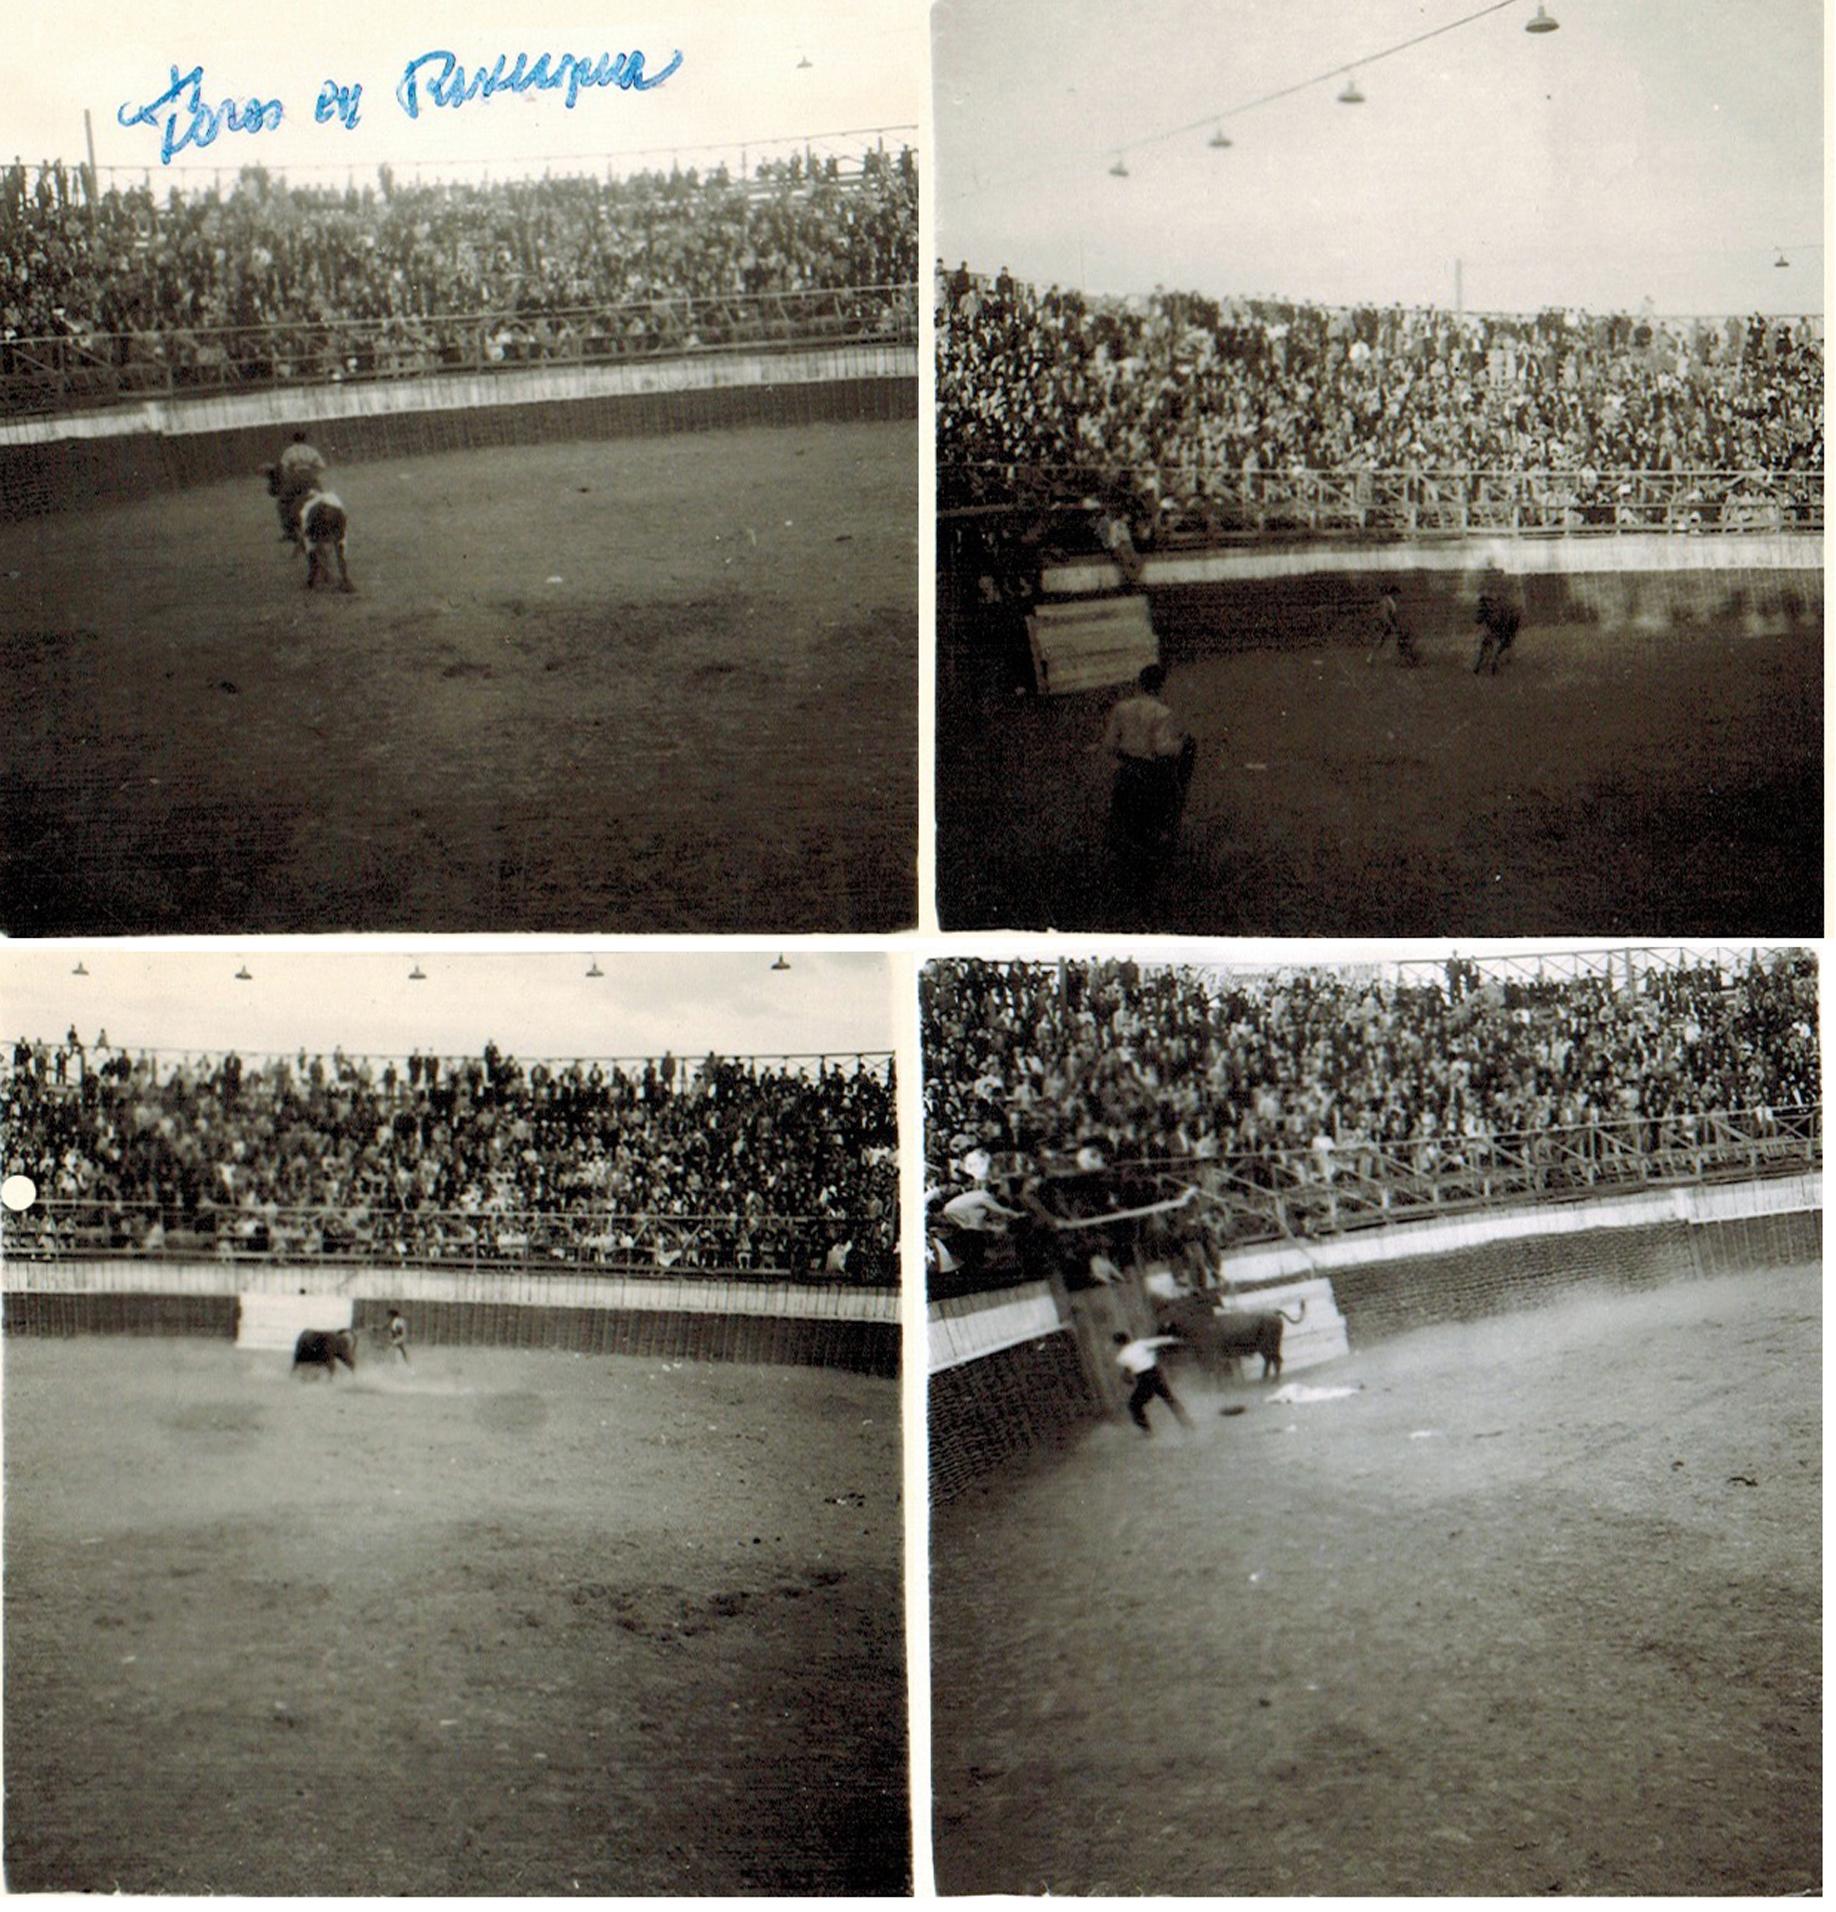 Enterreno - Fotos históricas de chile - fotos antiguas de Chile - Corridas de toros en Rancagua, 1945